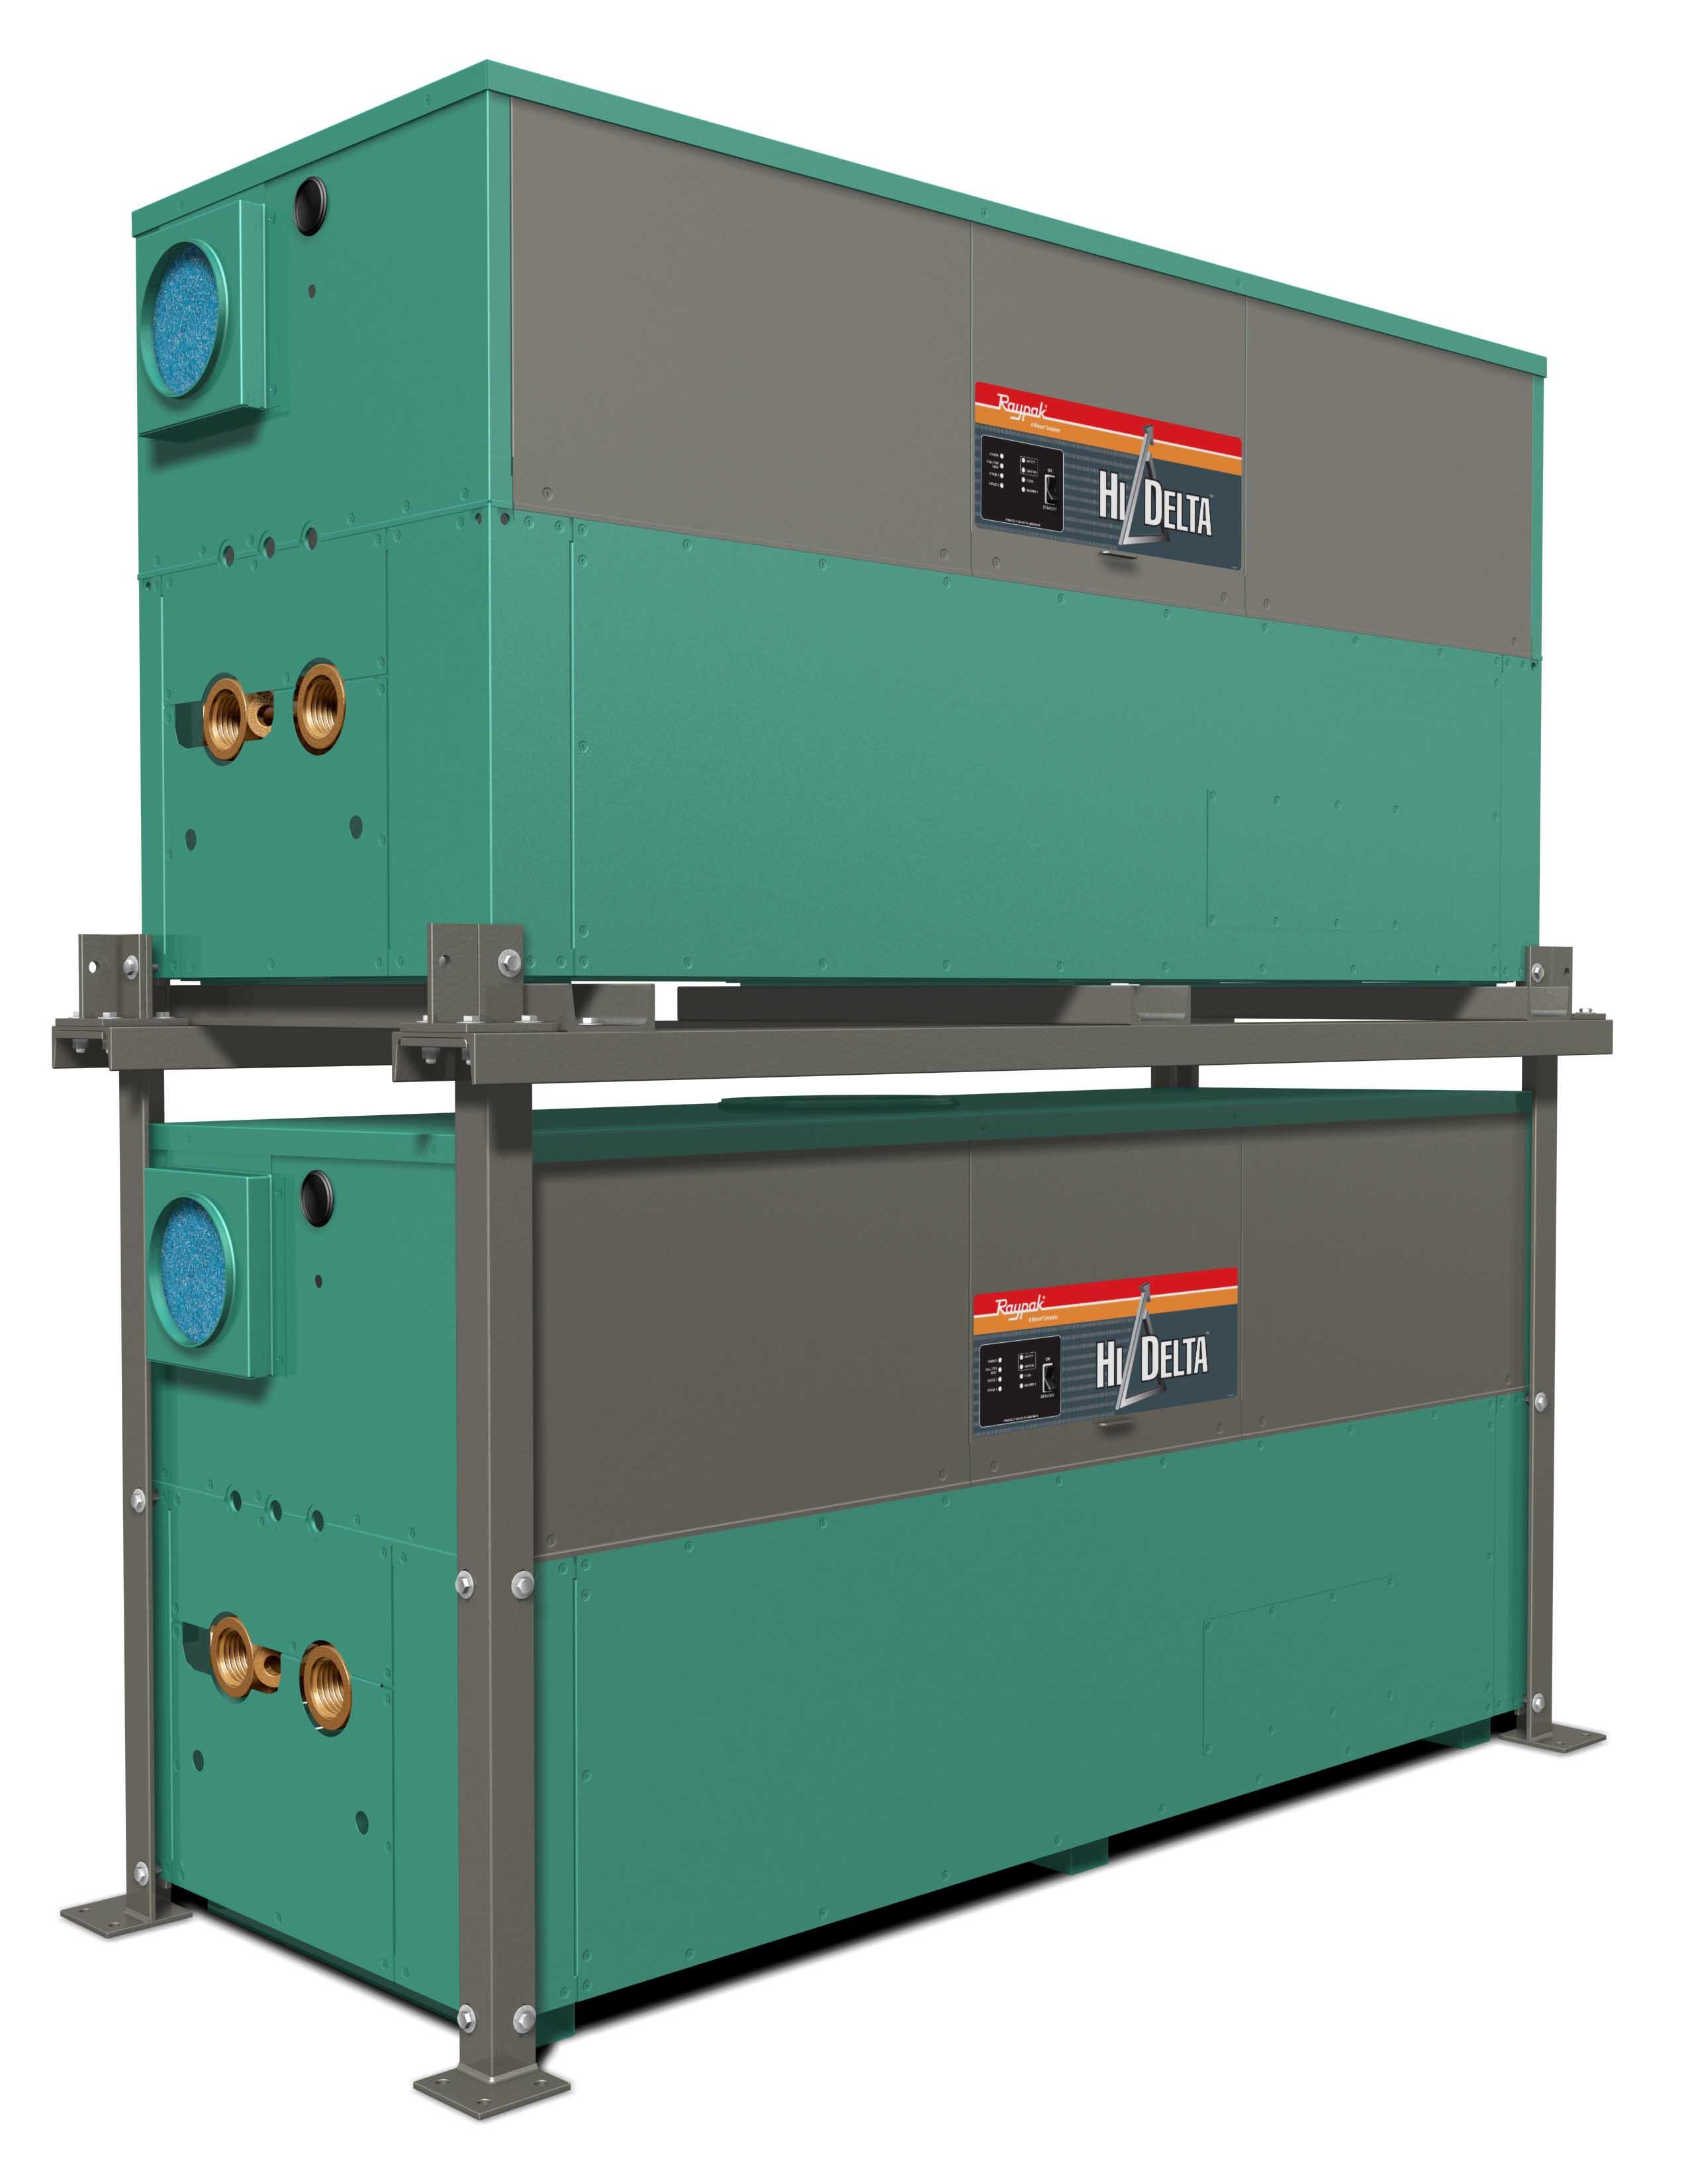 California Industrial (Refrigeration/Machines) - 24 Hour Service ...